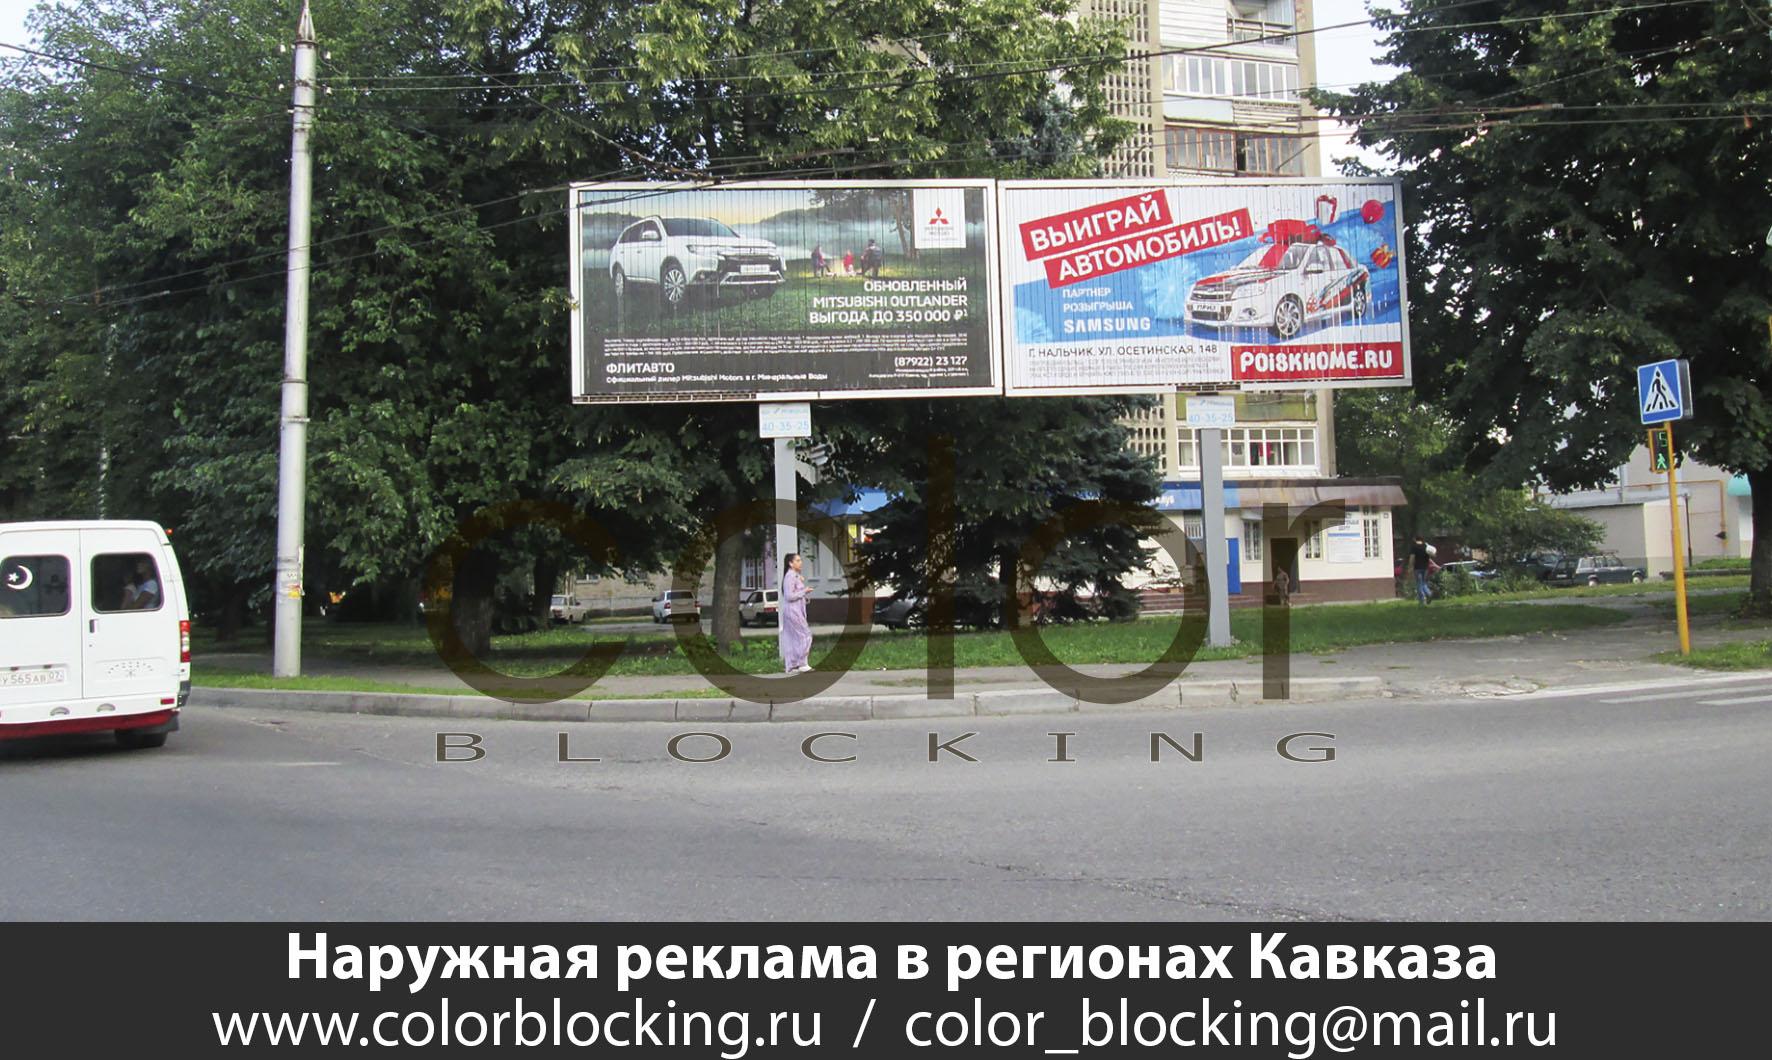 Реклама на билбордах в регионах Кавказа КБР